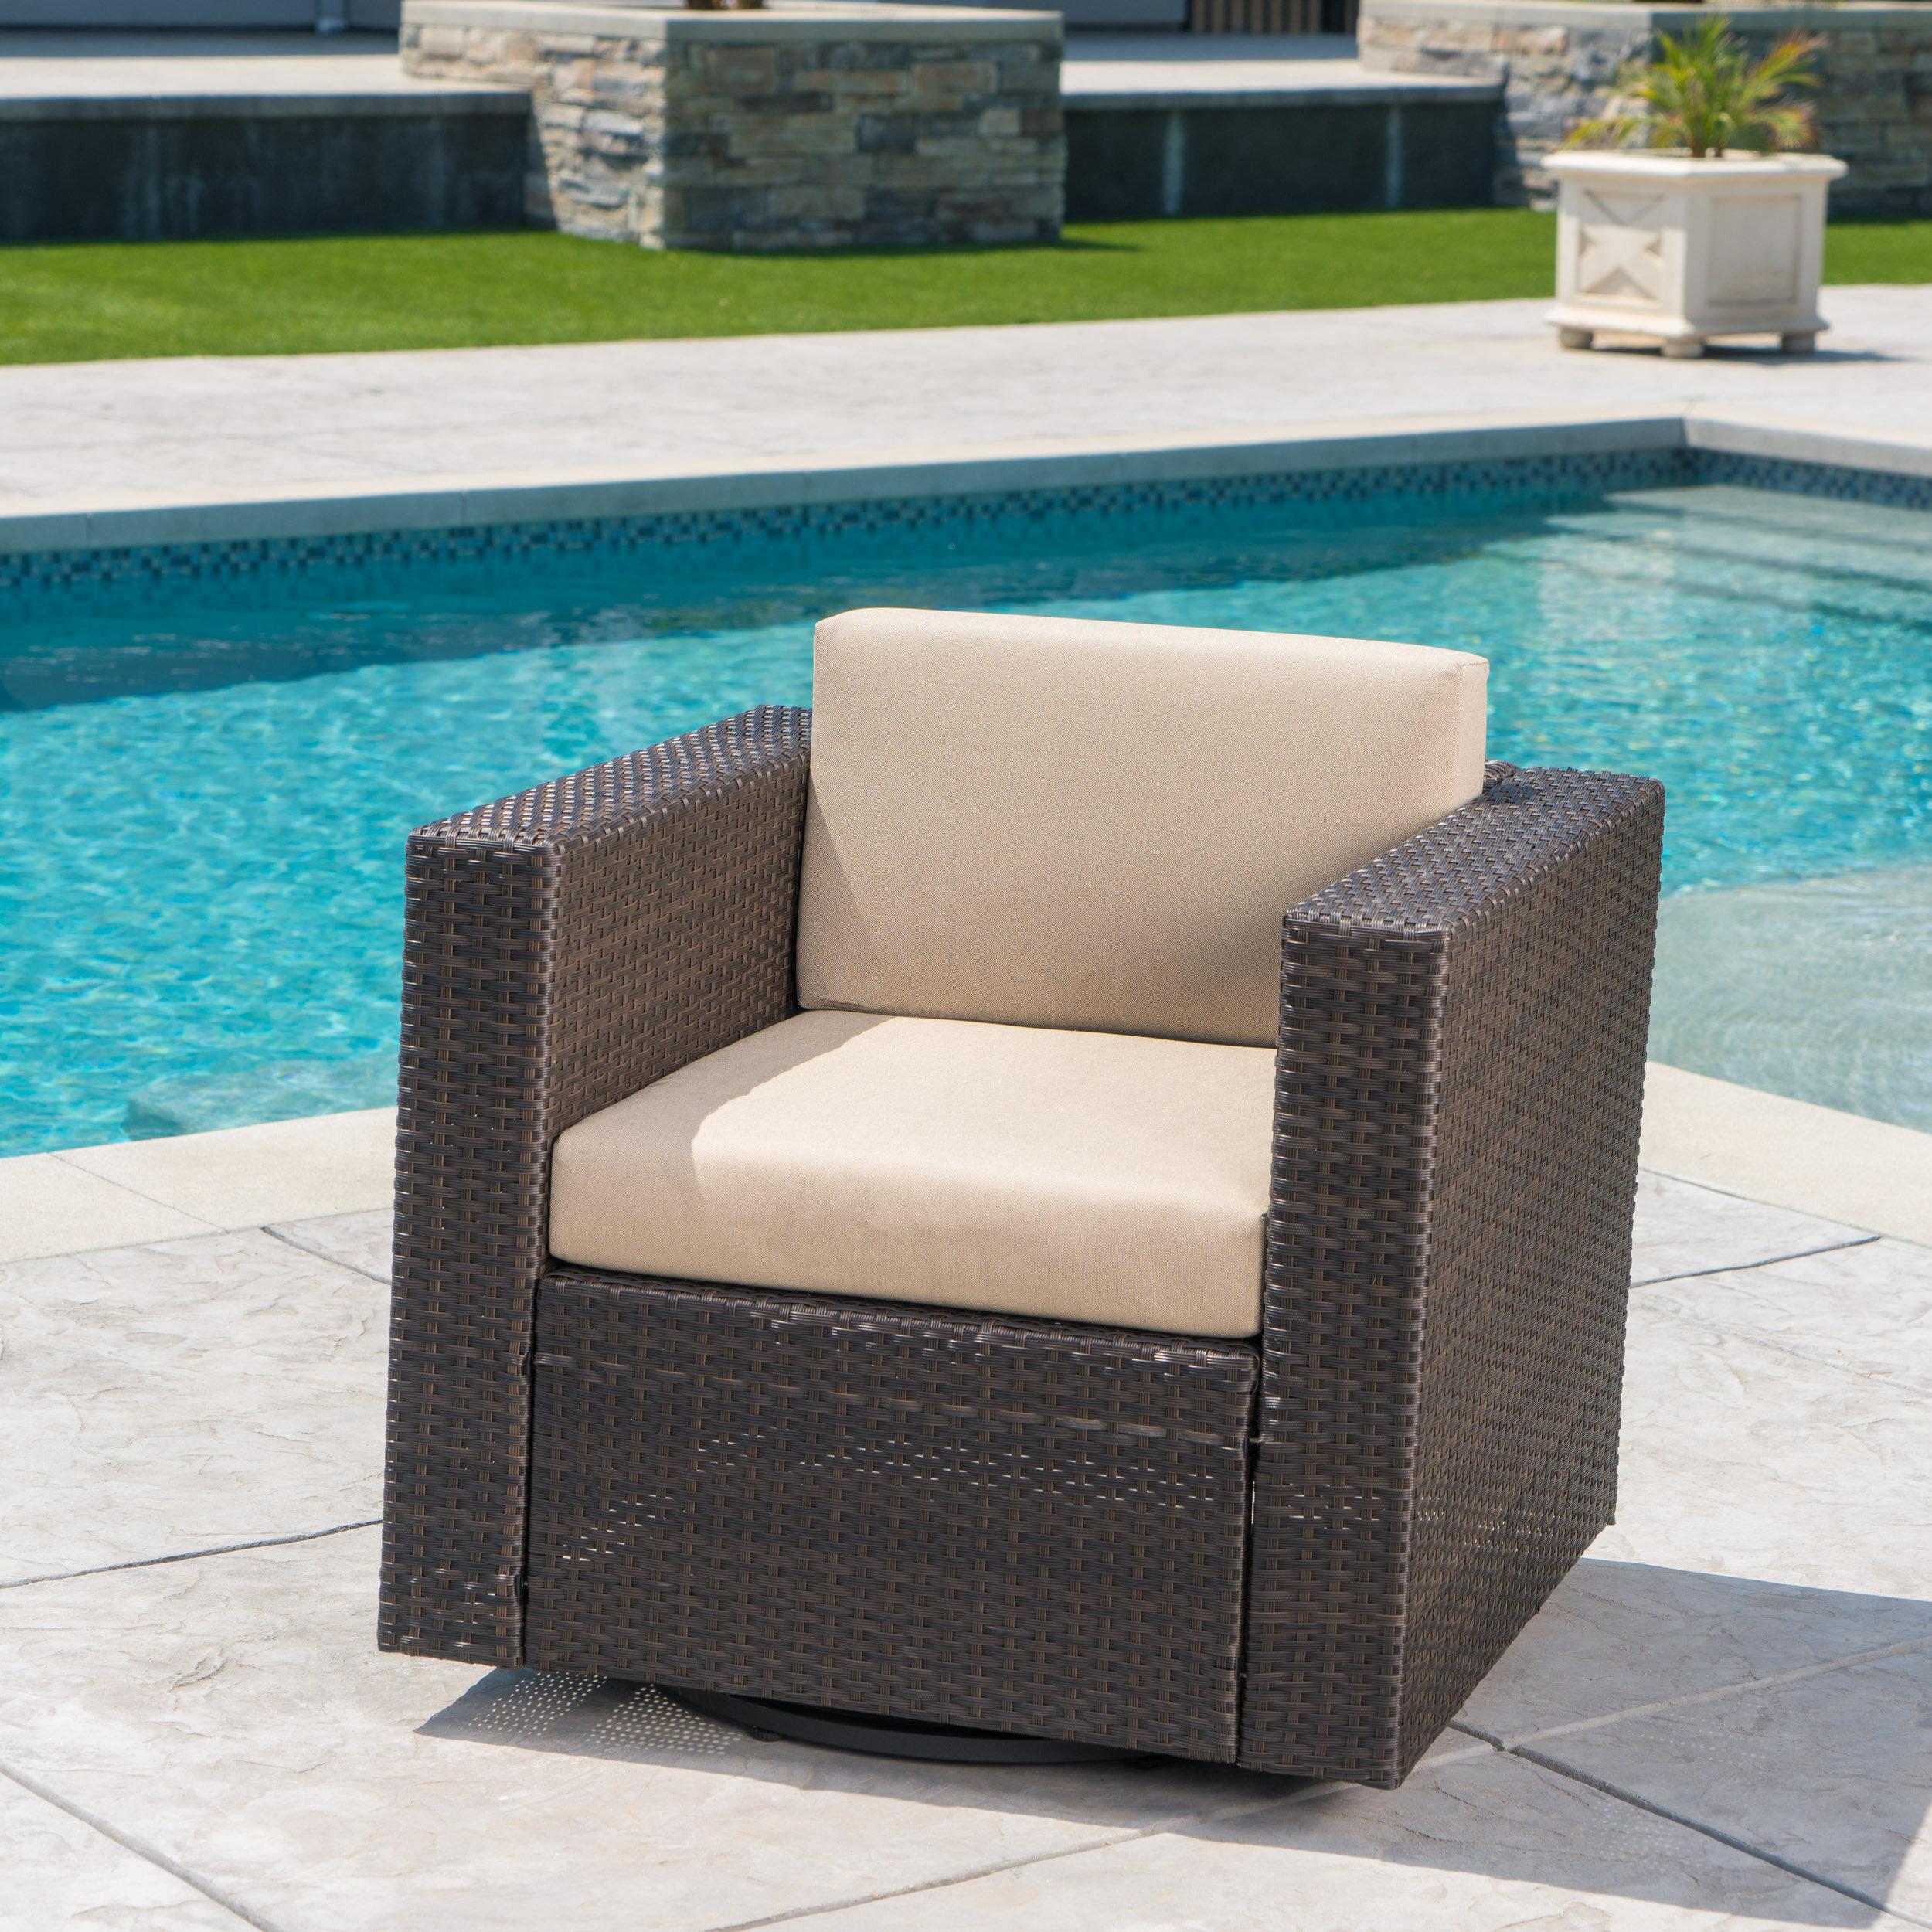 Incroyable Ivy Bronx Jemaine Outdoor Swivel Club Chair With Cushions | Wayfair